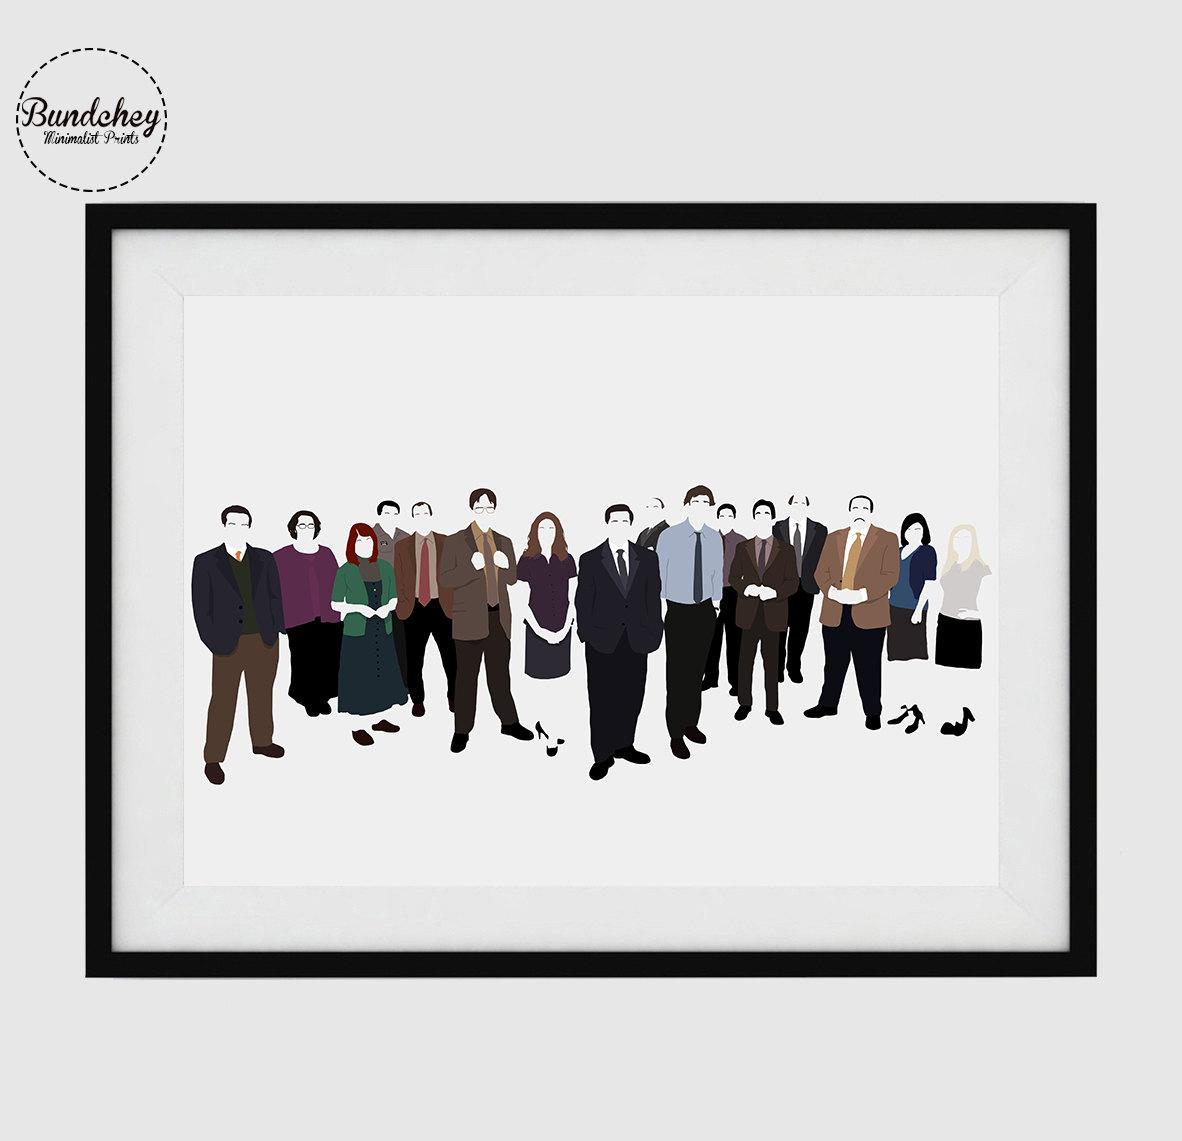 THE OFFICE TV Minimalist Poster Art By Bundchey On Etsy